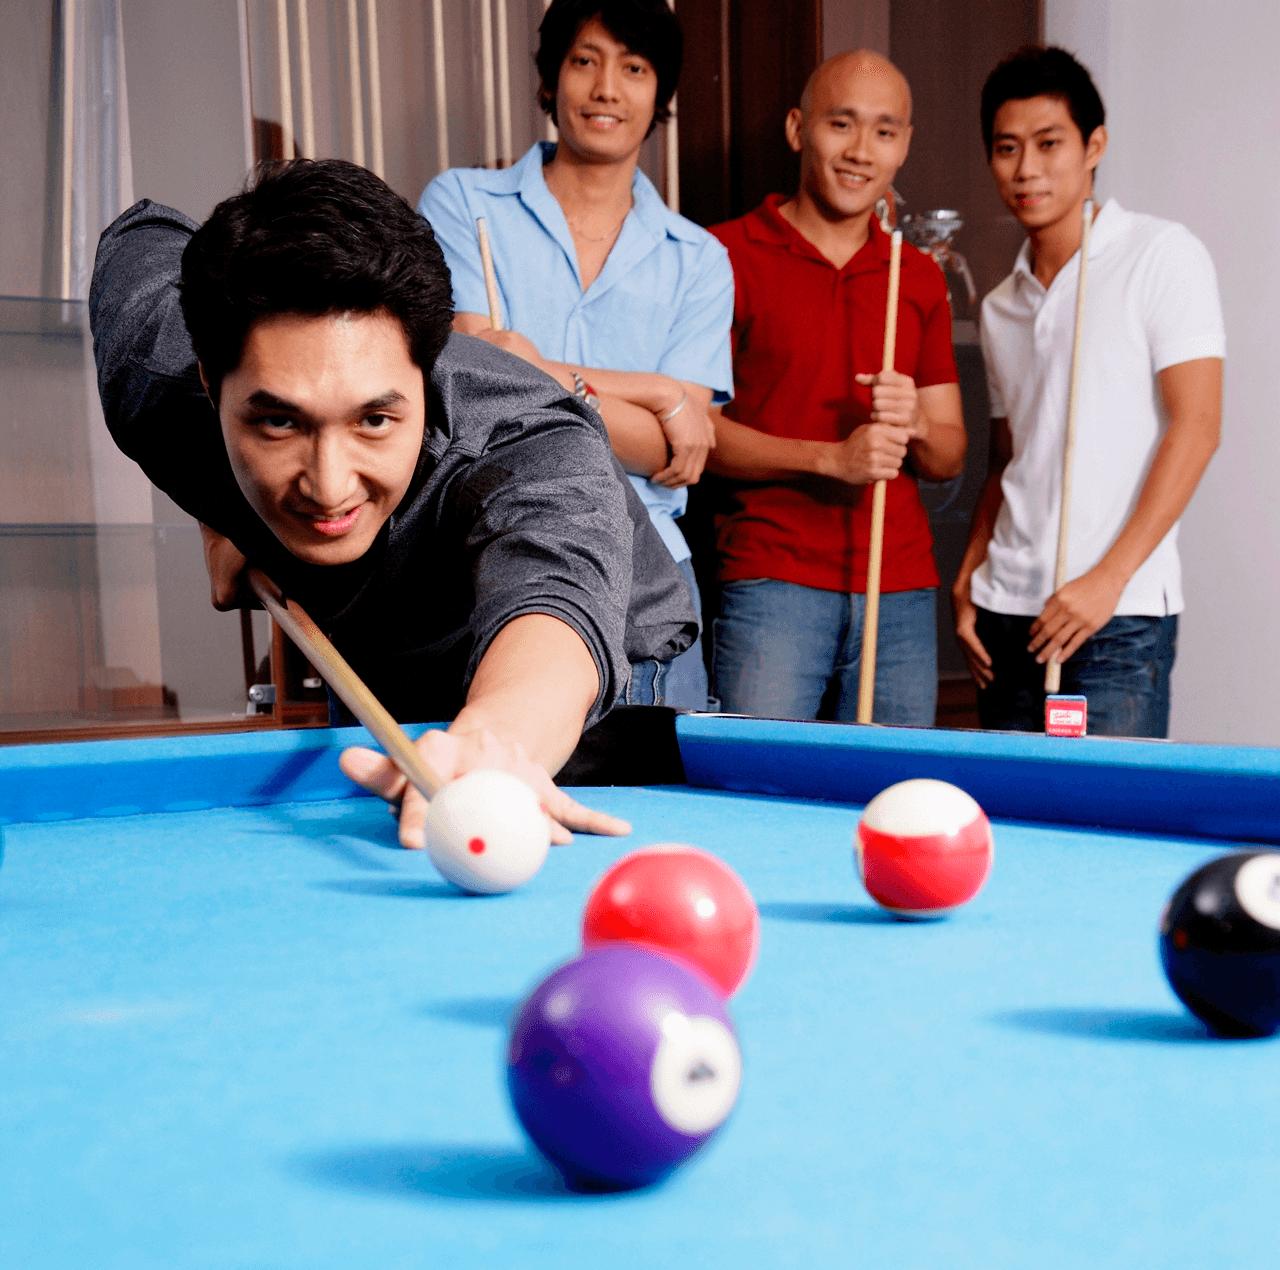 Man Cave vs. Diva Den Playing Pool image